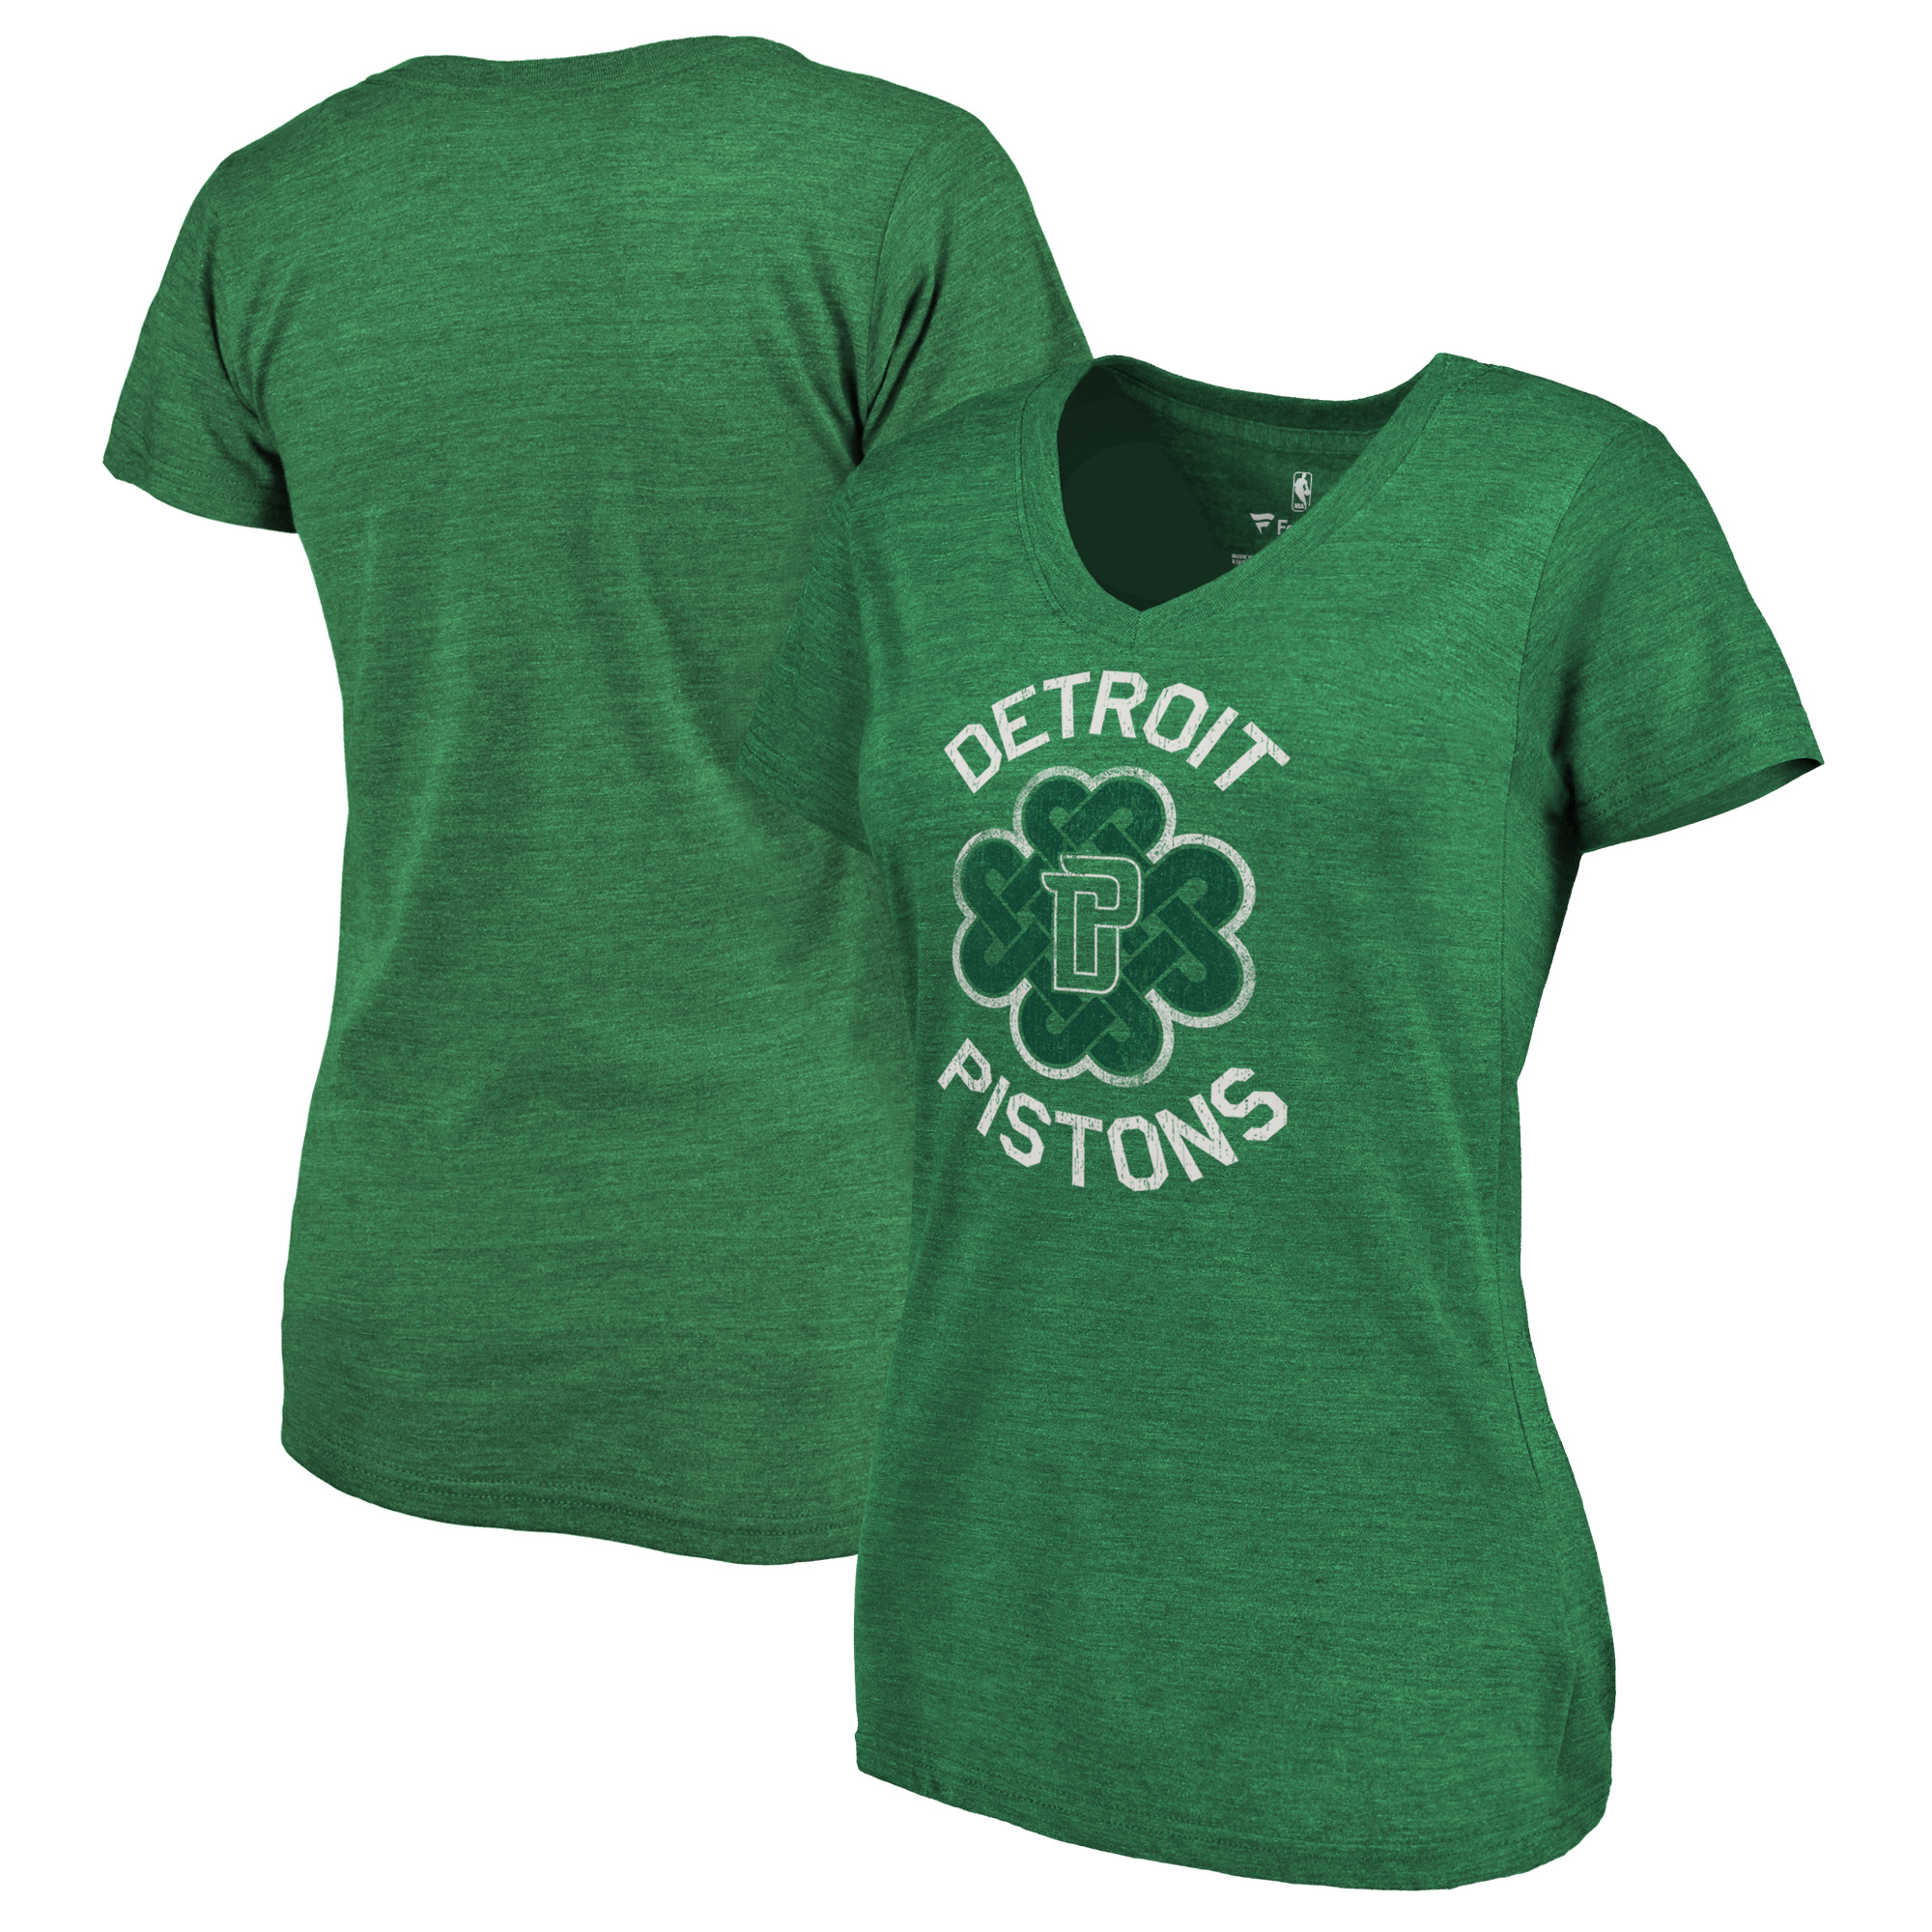 Detroit Pistons Fanatics Branded Women's St. Patrick's Day Luck Tradition Tri-Blend V-Neck T-Shirt - Green